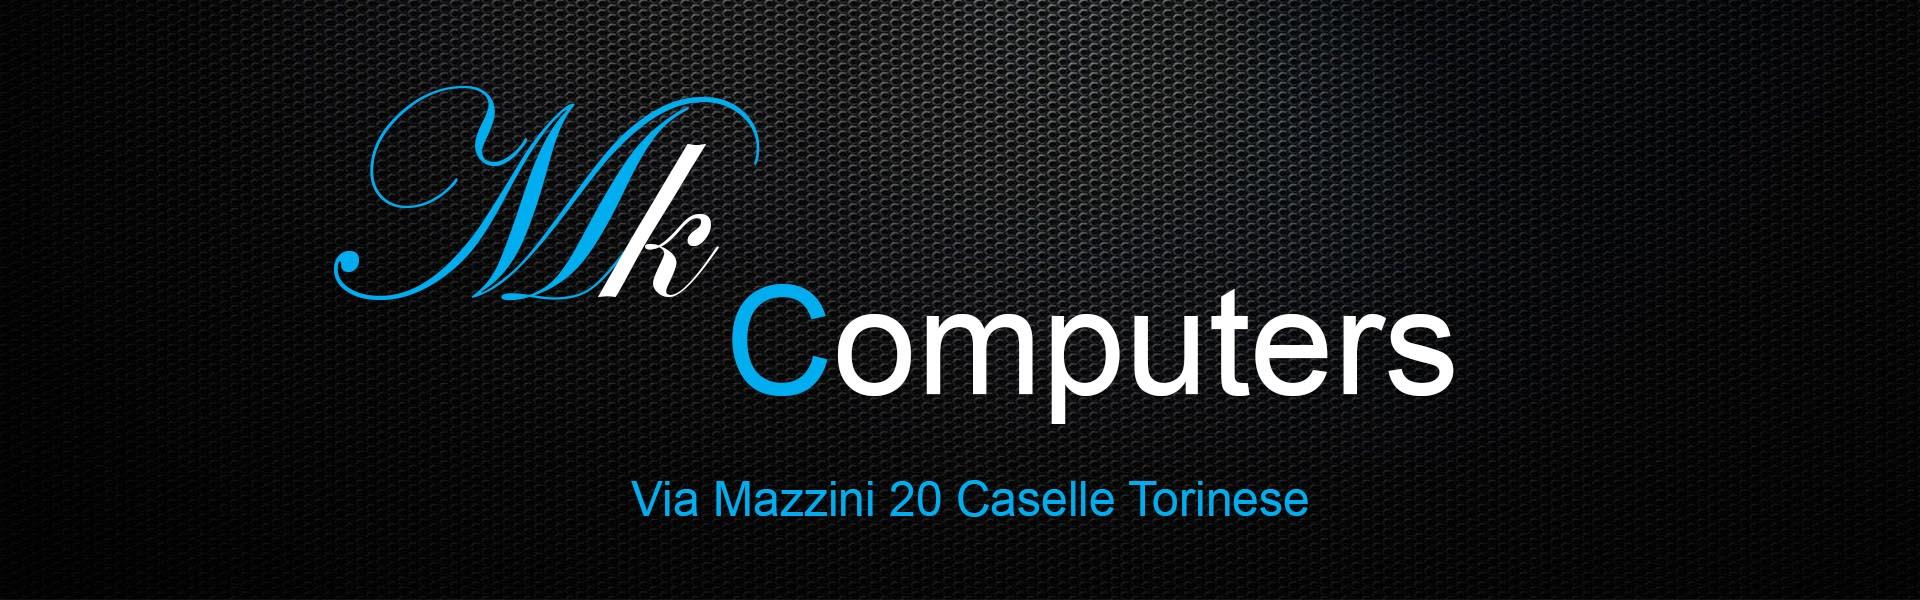 Mk Computers - Assistenza PC e Siti Web Caselle Torinese - Mk Computers